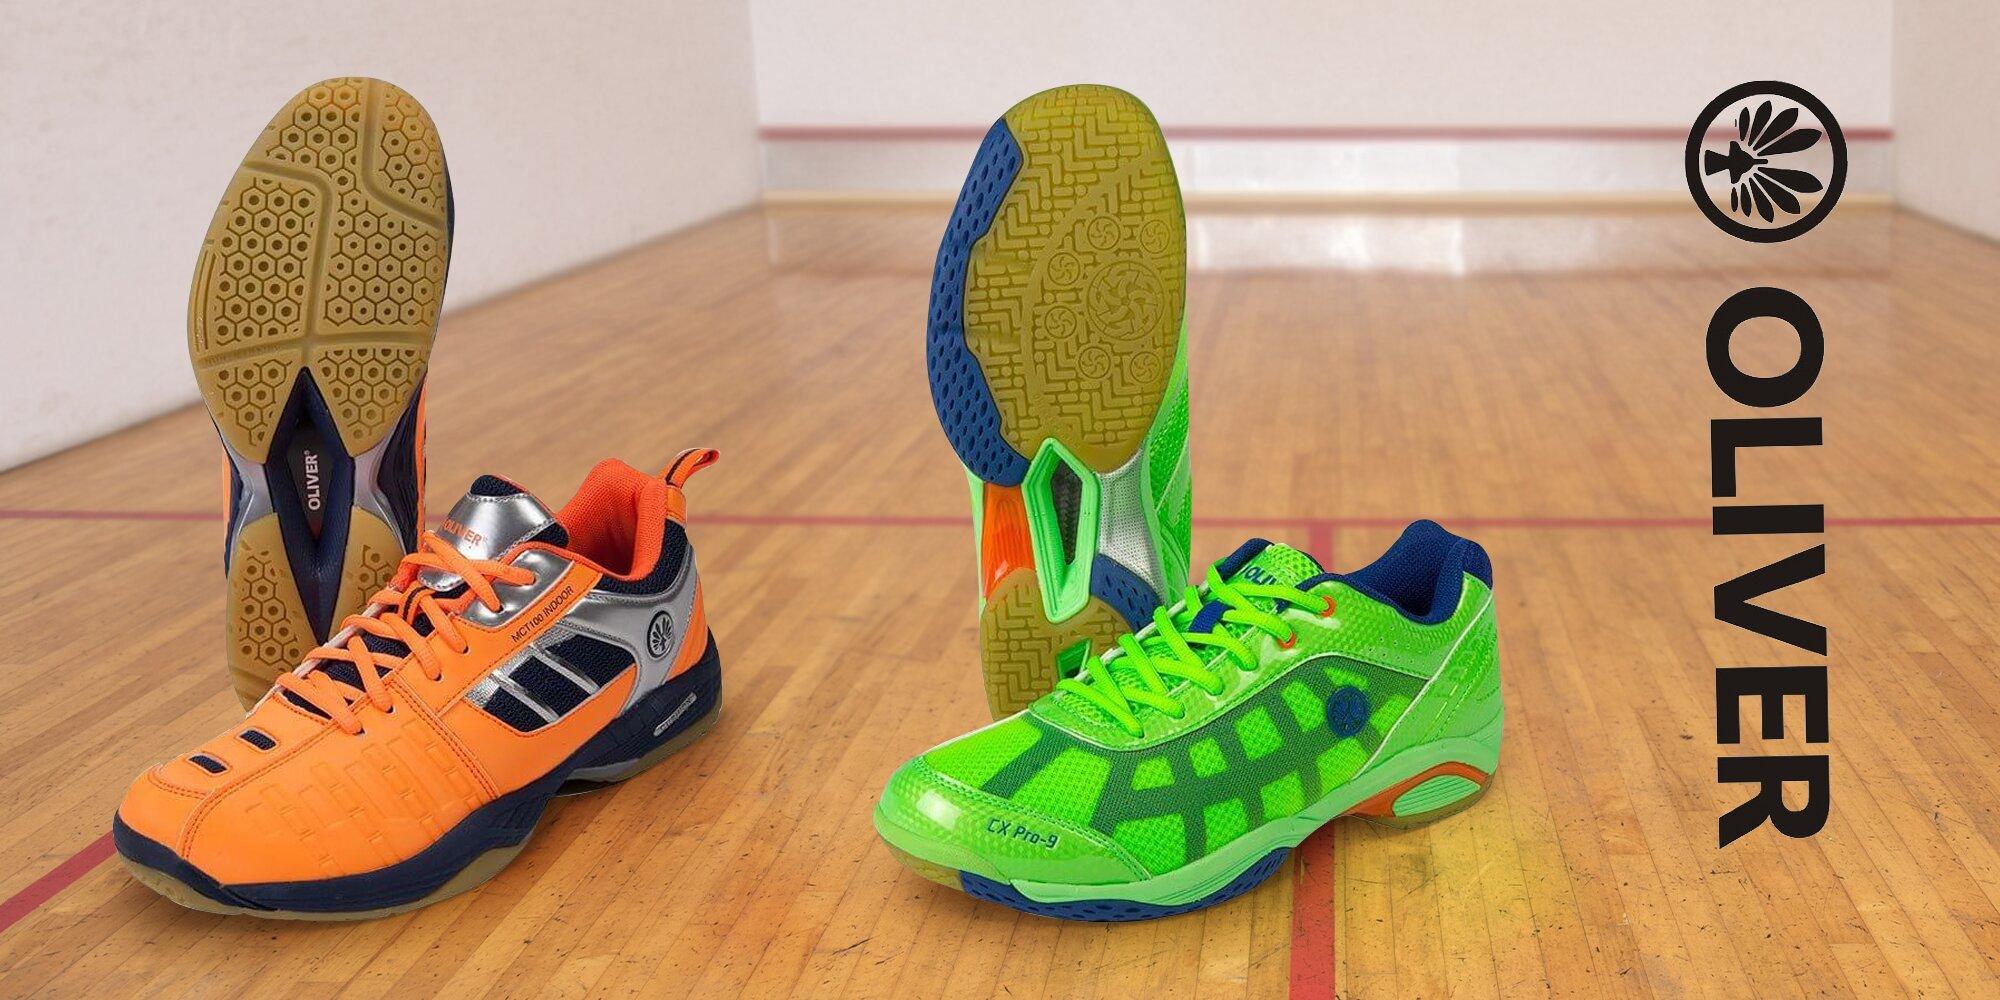 b8c52e1b7b3 Unisex obuv OLIVER pro všechny indoor aktivity